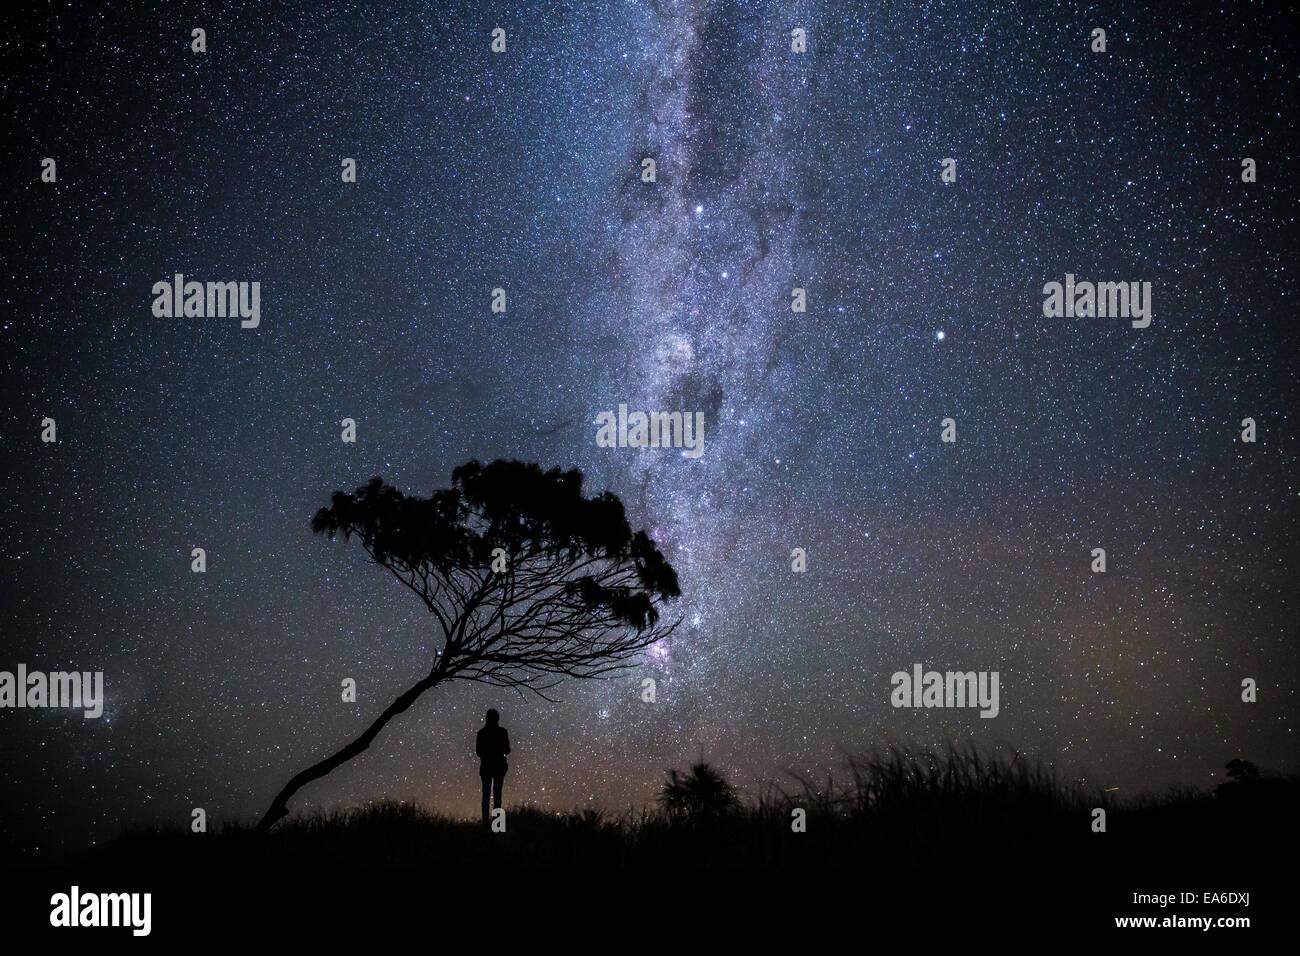 Australia, Yamba, Man standing under stars at night - Stock Image